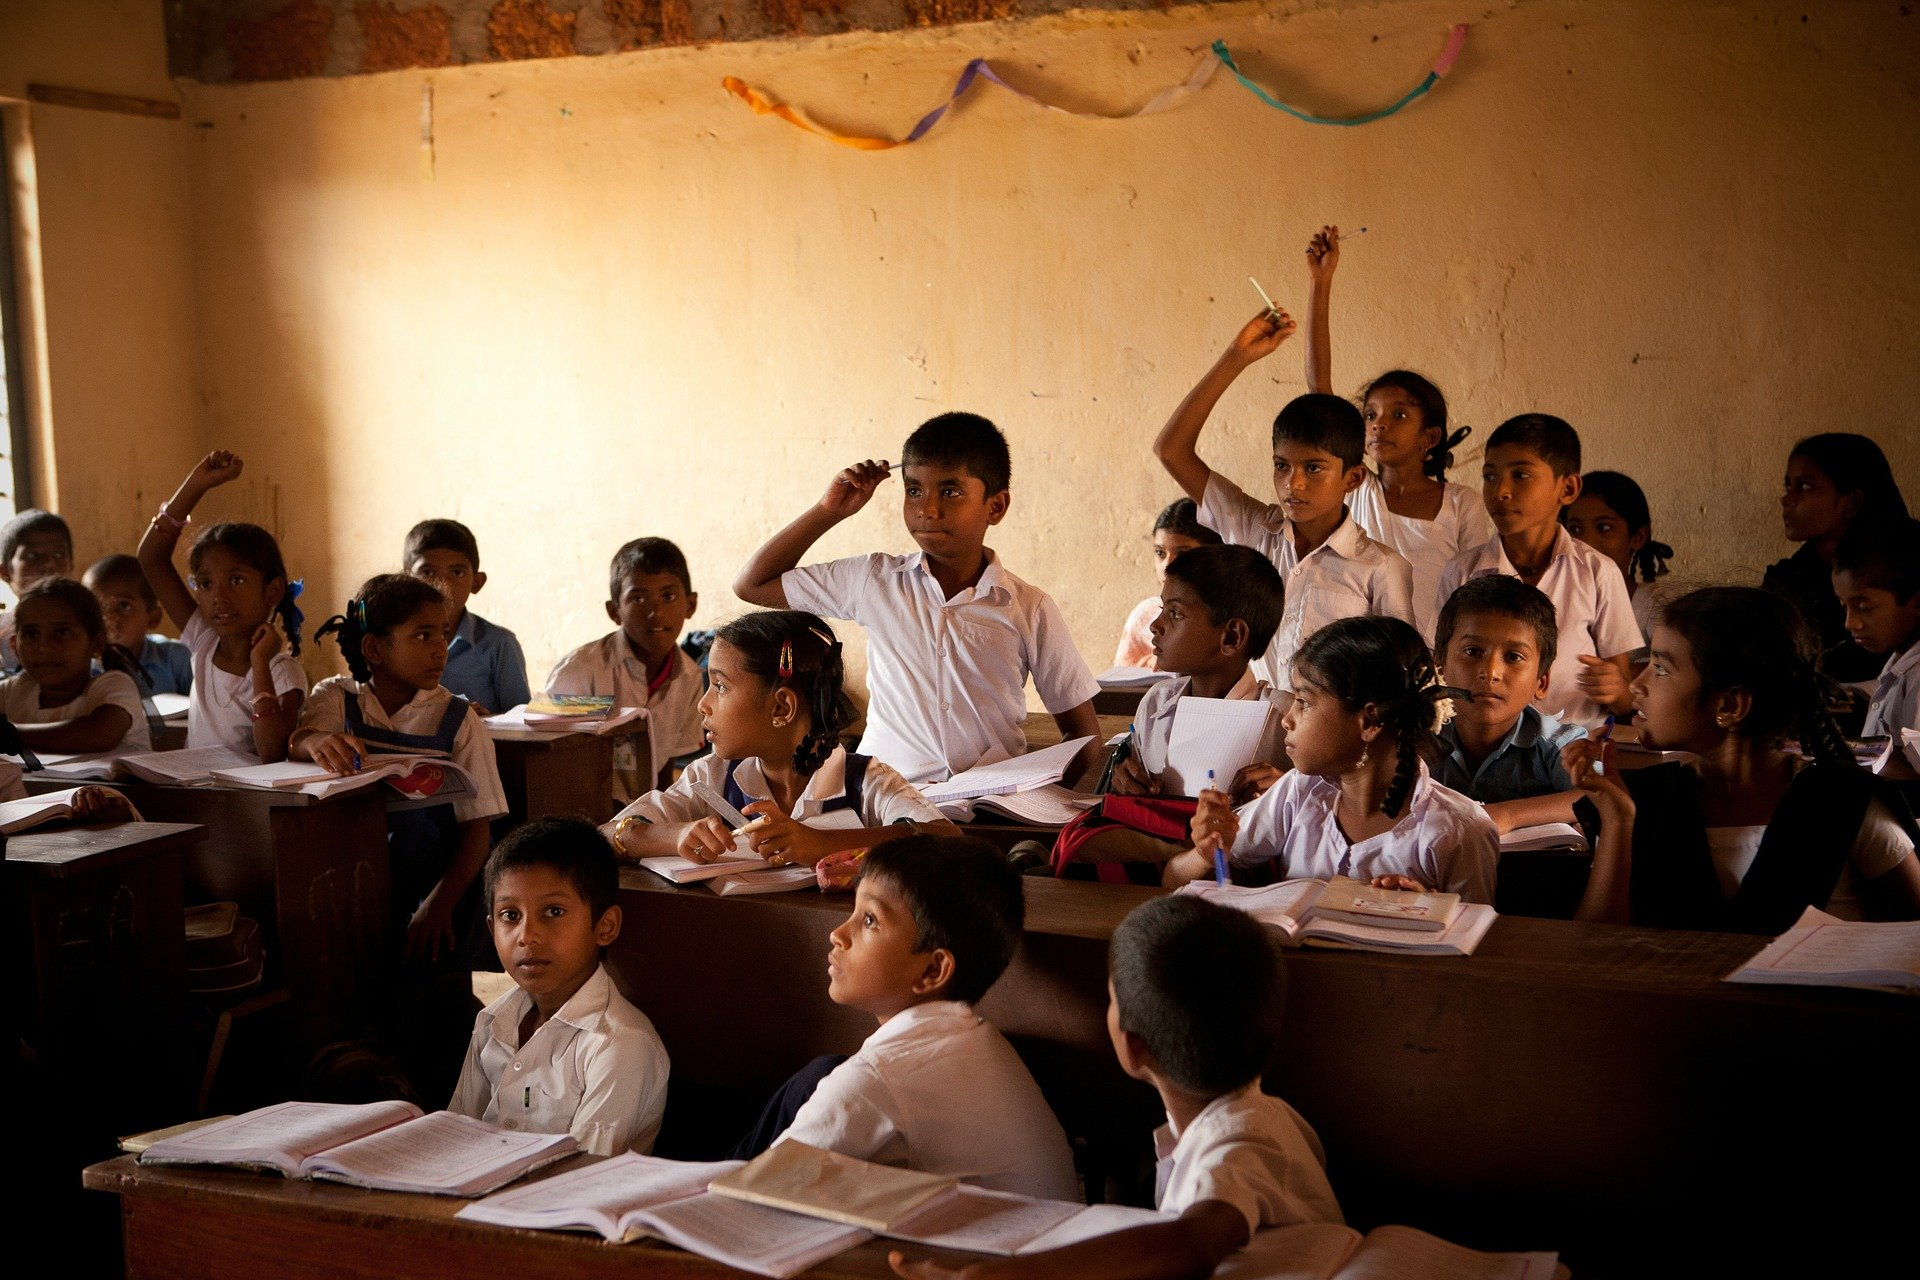 school education ifixdallas repair